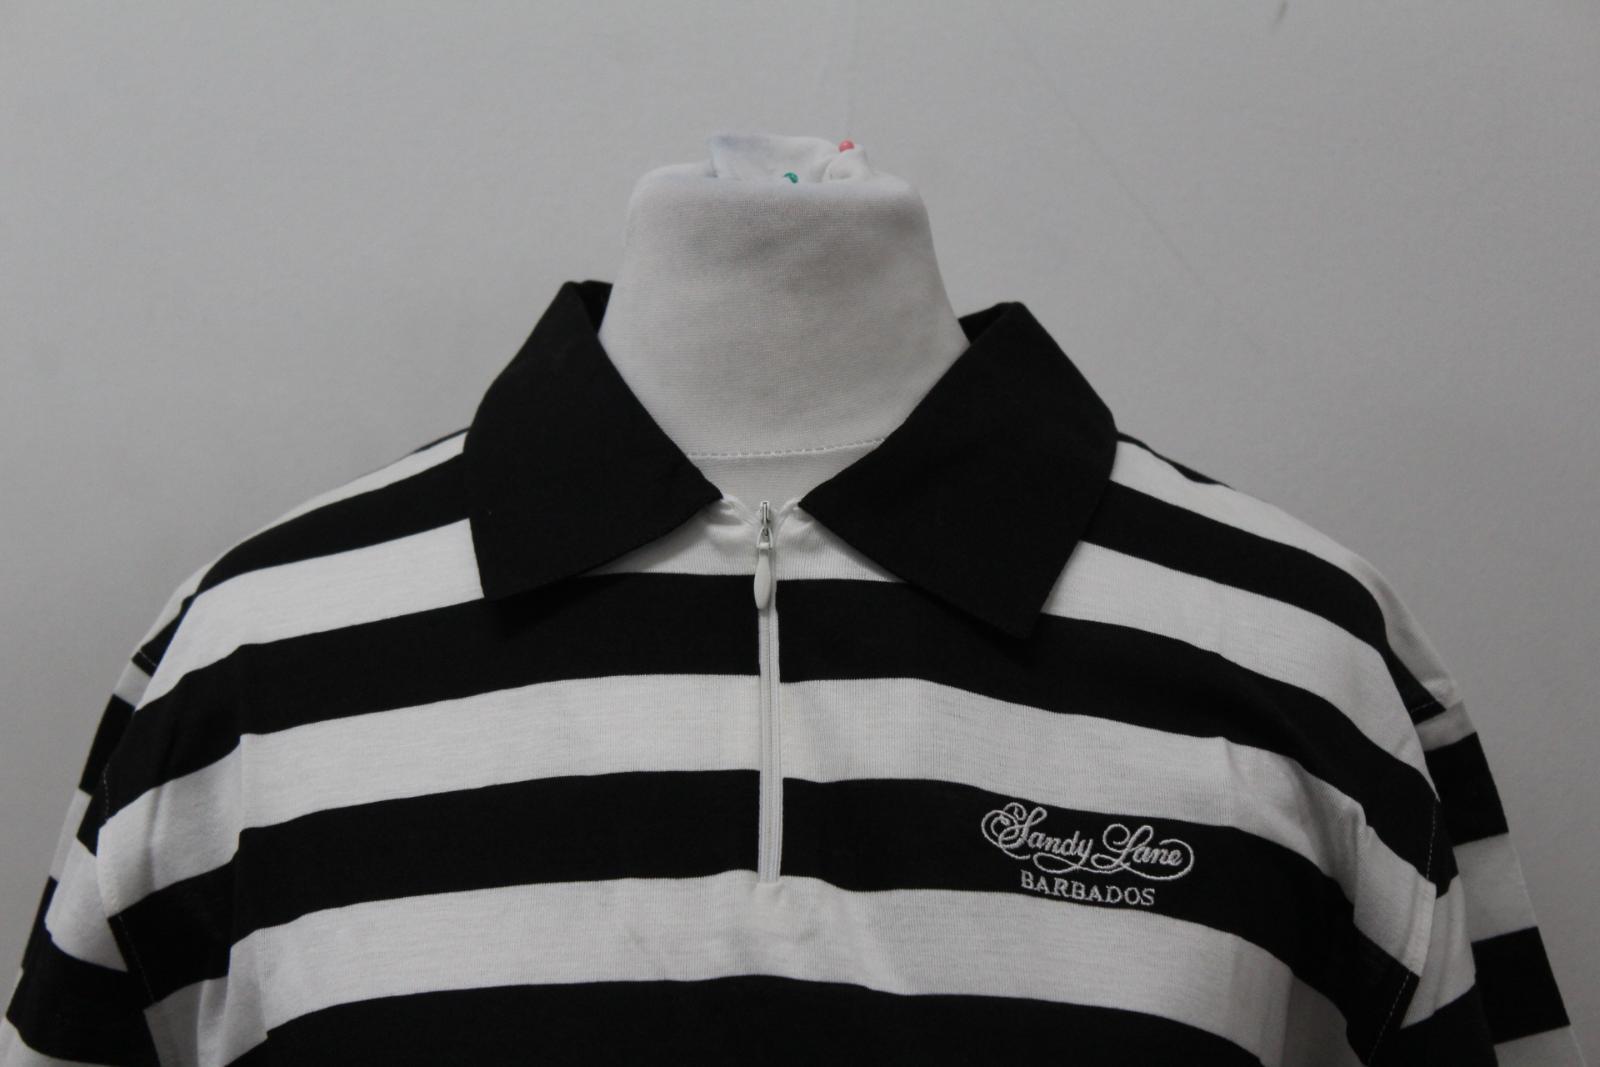 BURBERRY-GOLF-Ladies-Black-White-Cotton-Short-Sleeve-Striped-Polo-Shirt-S-BNWT thumbnail 3